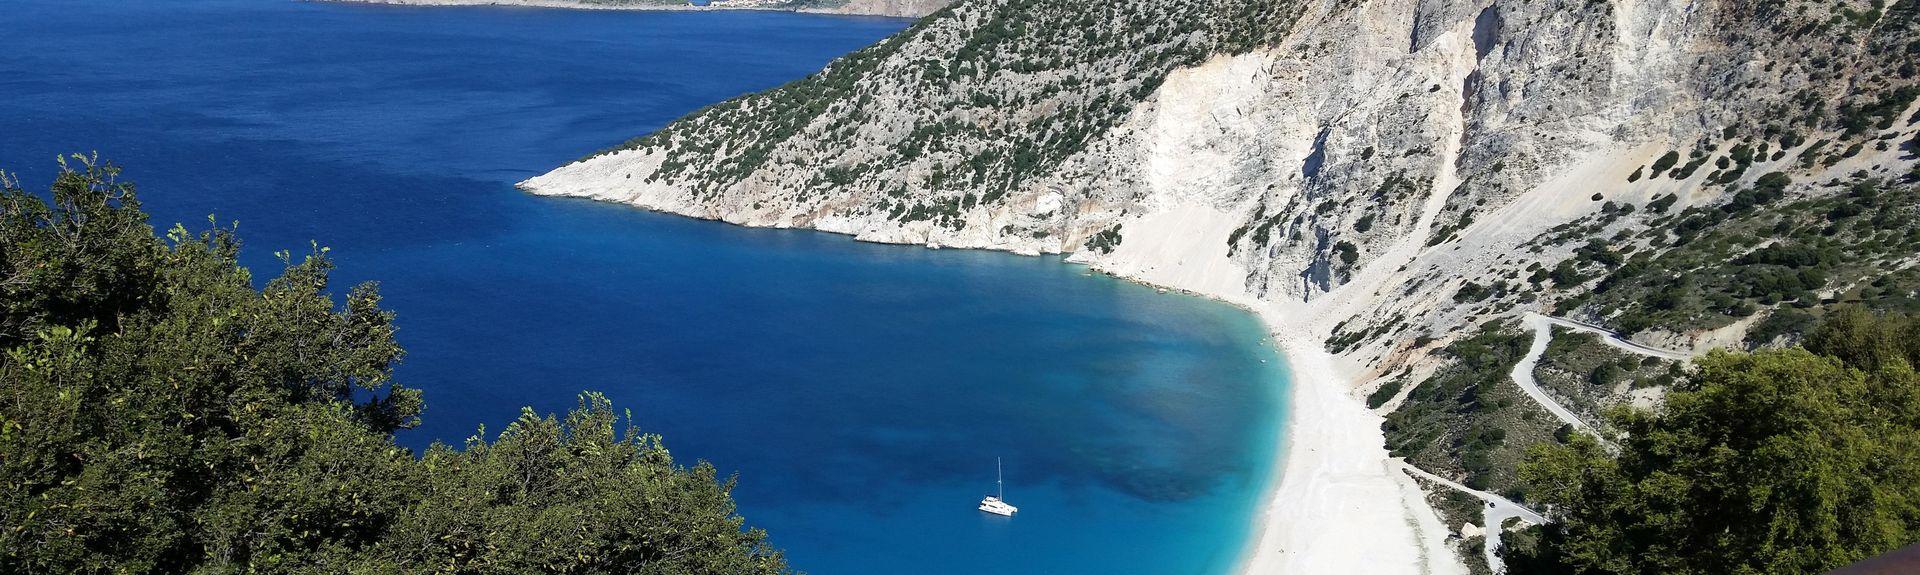 Fternon, Peloponnesos, Kreikka